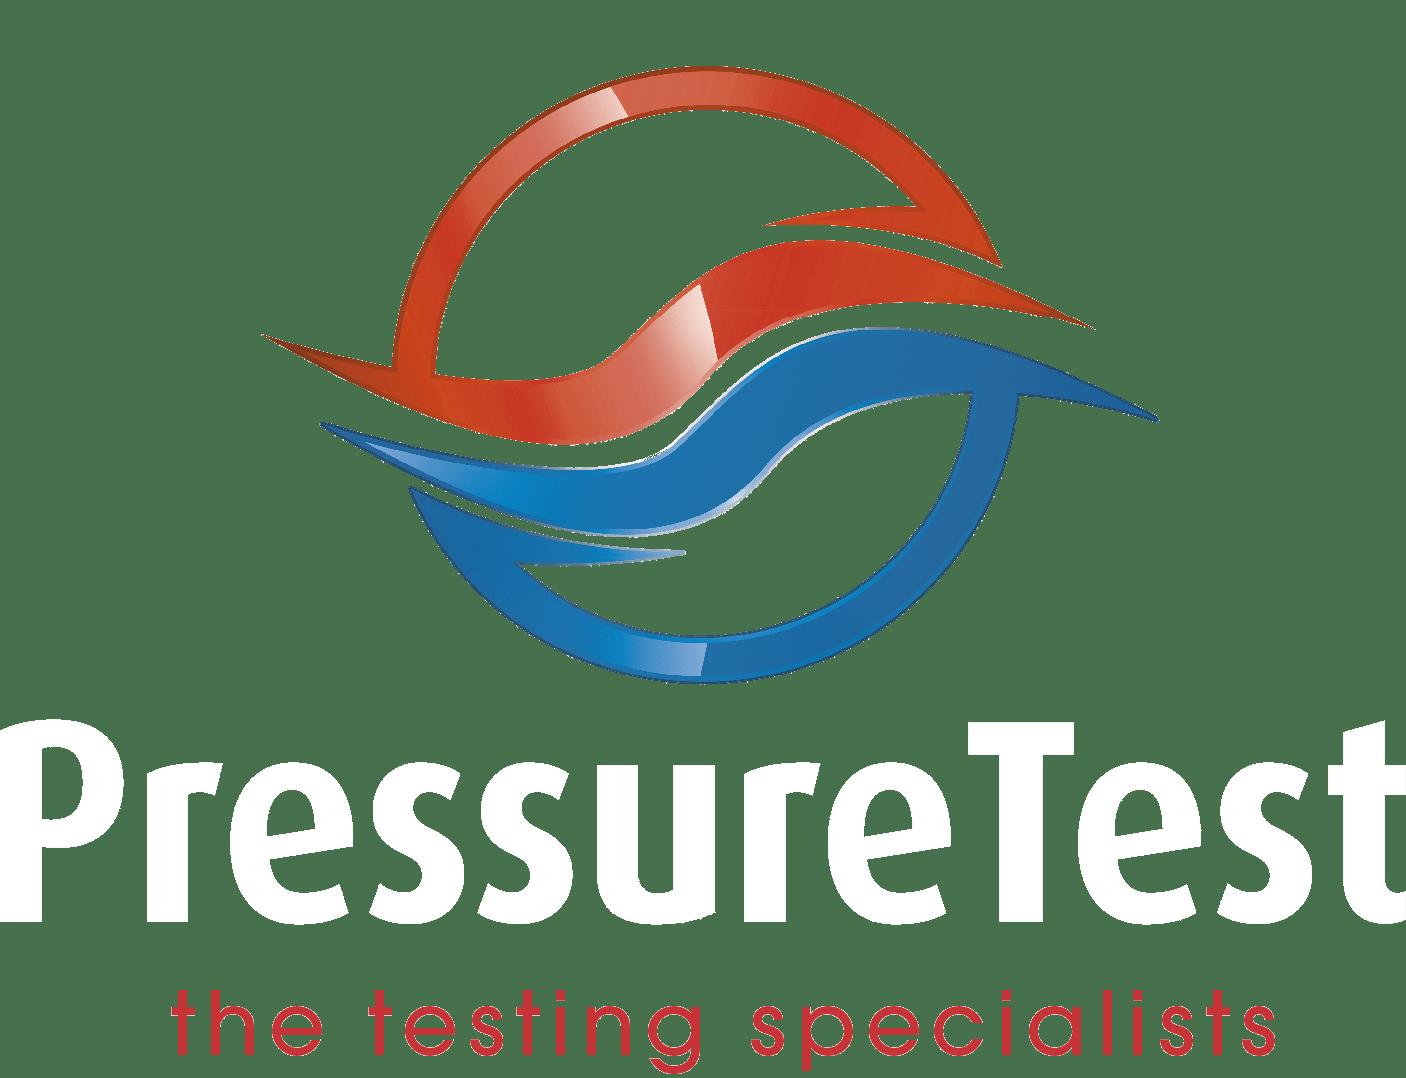 Fire Protection Services Wokingham, Berkshire - Pressure Test